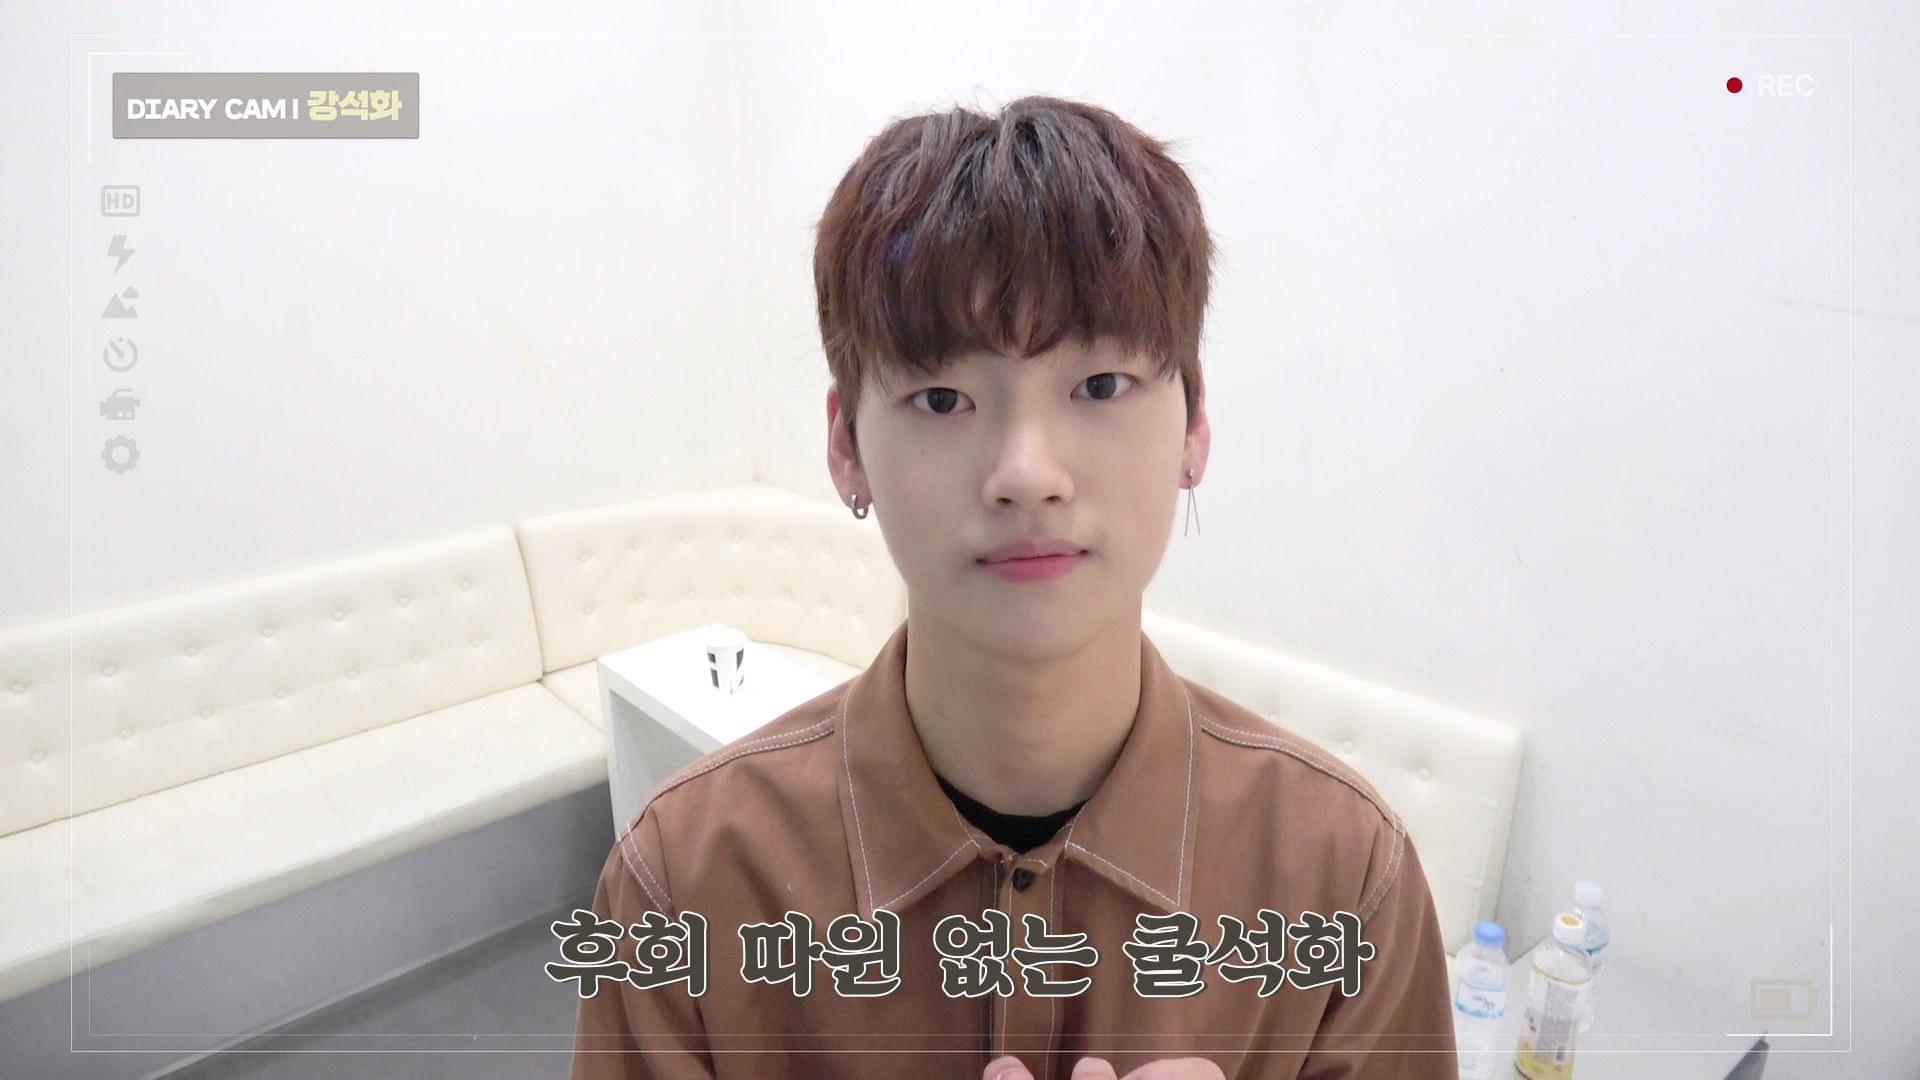 [DIARY CAM 3] 강석화 <KANG SEOKHWA> l YG보석함